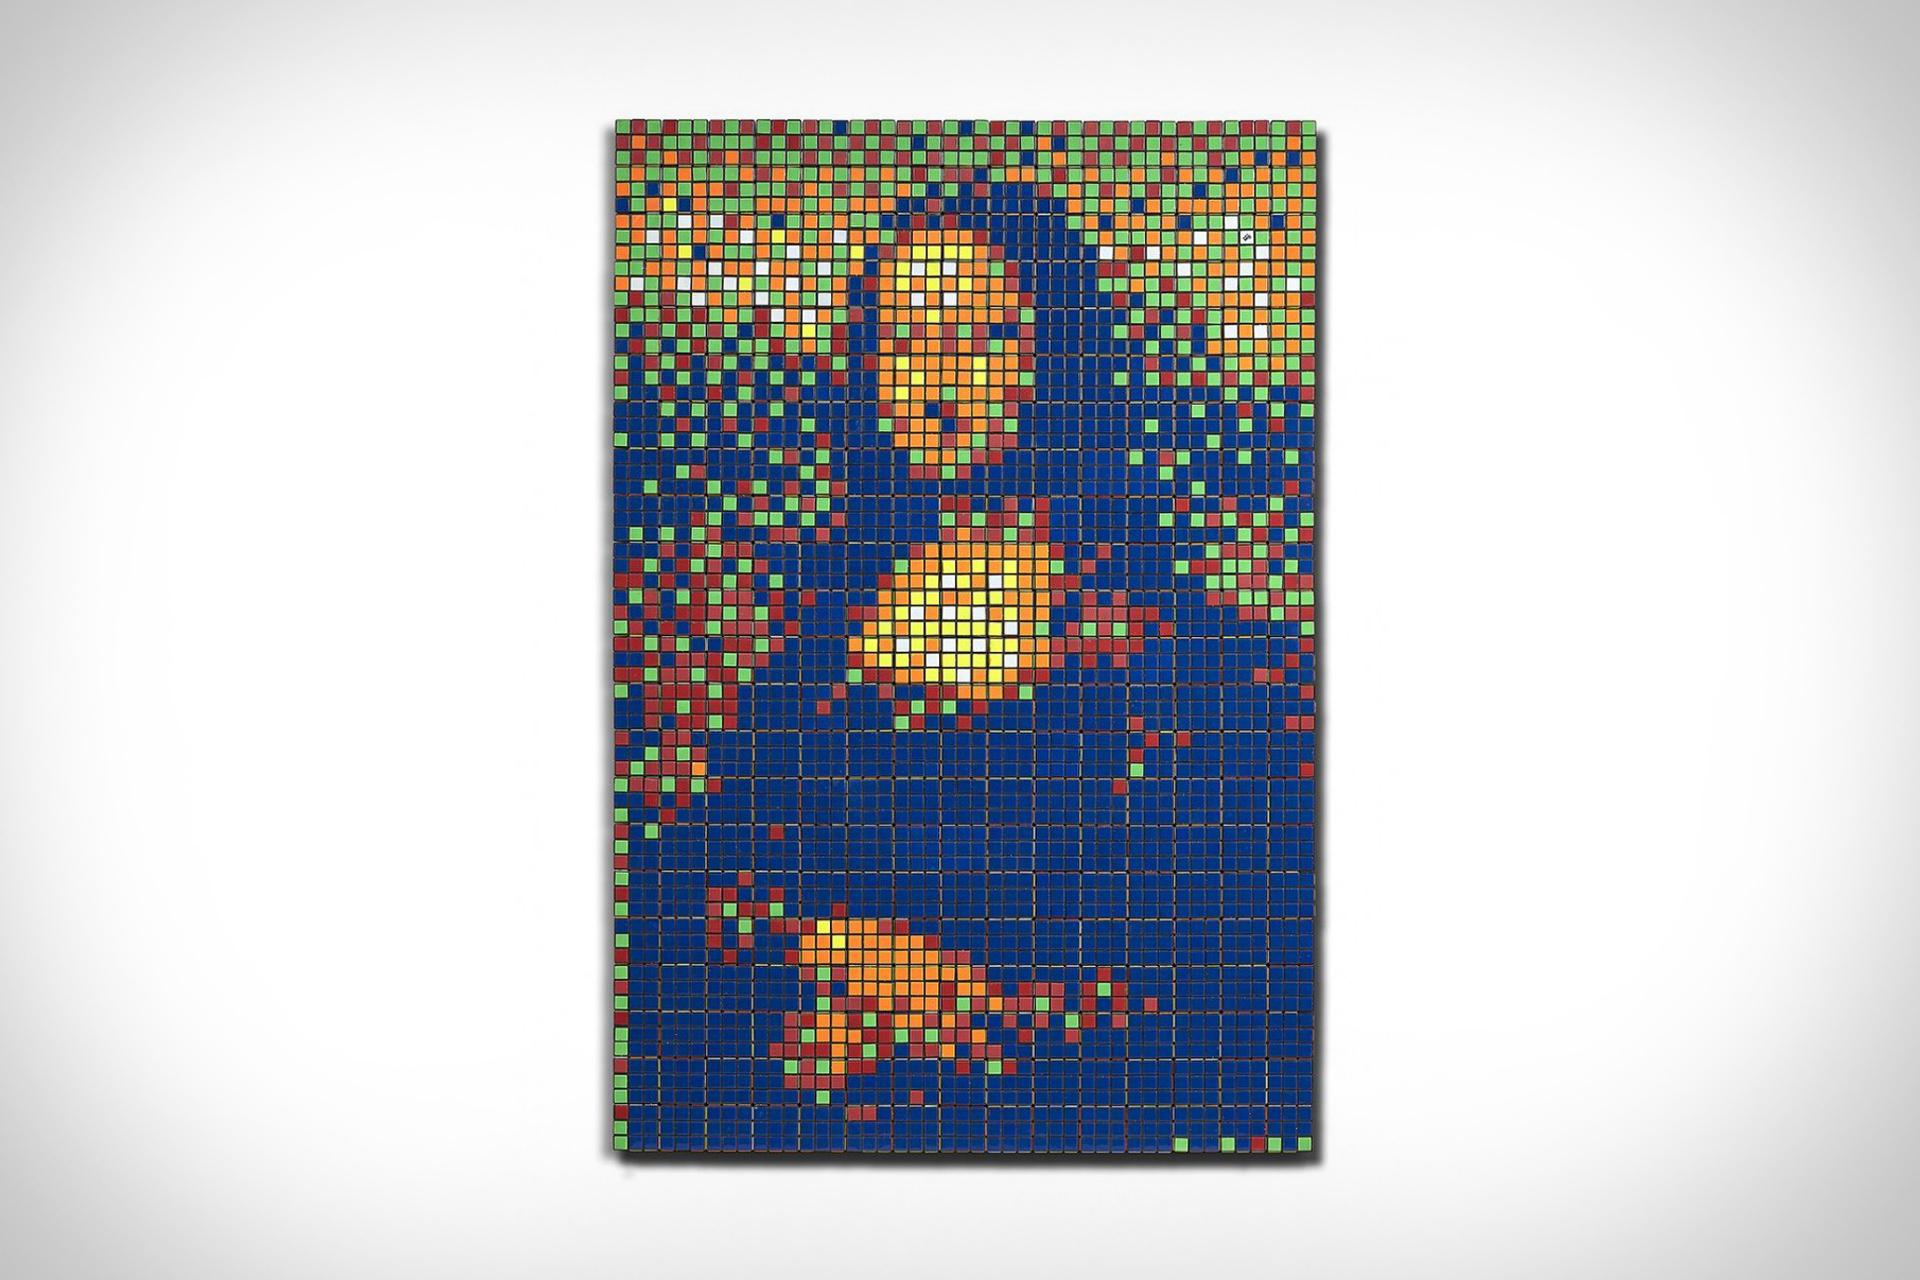 Invader's Rubik Mona Lisa